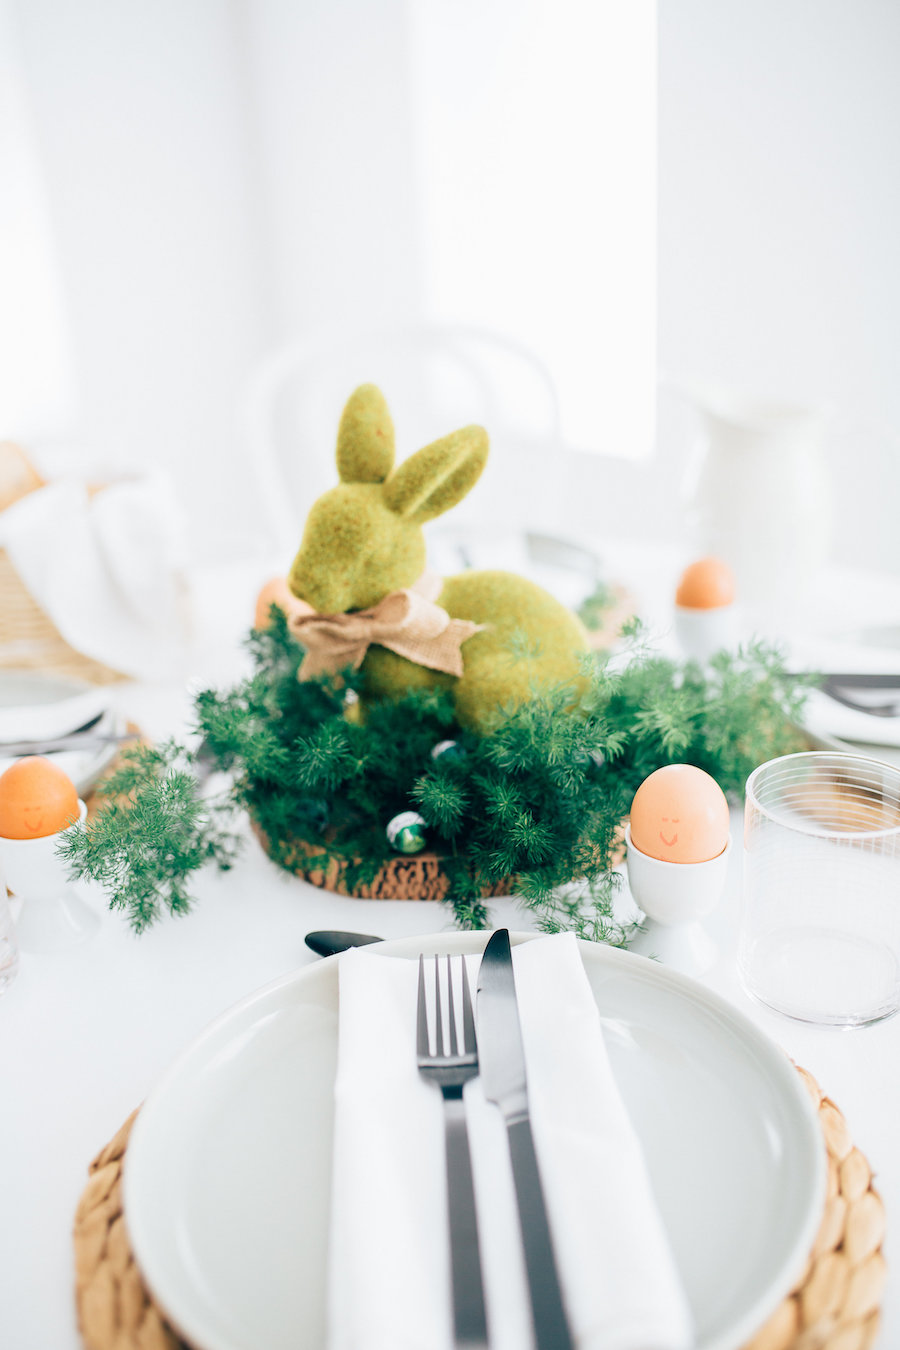 Bunny centrepiece